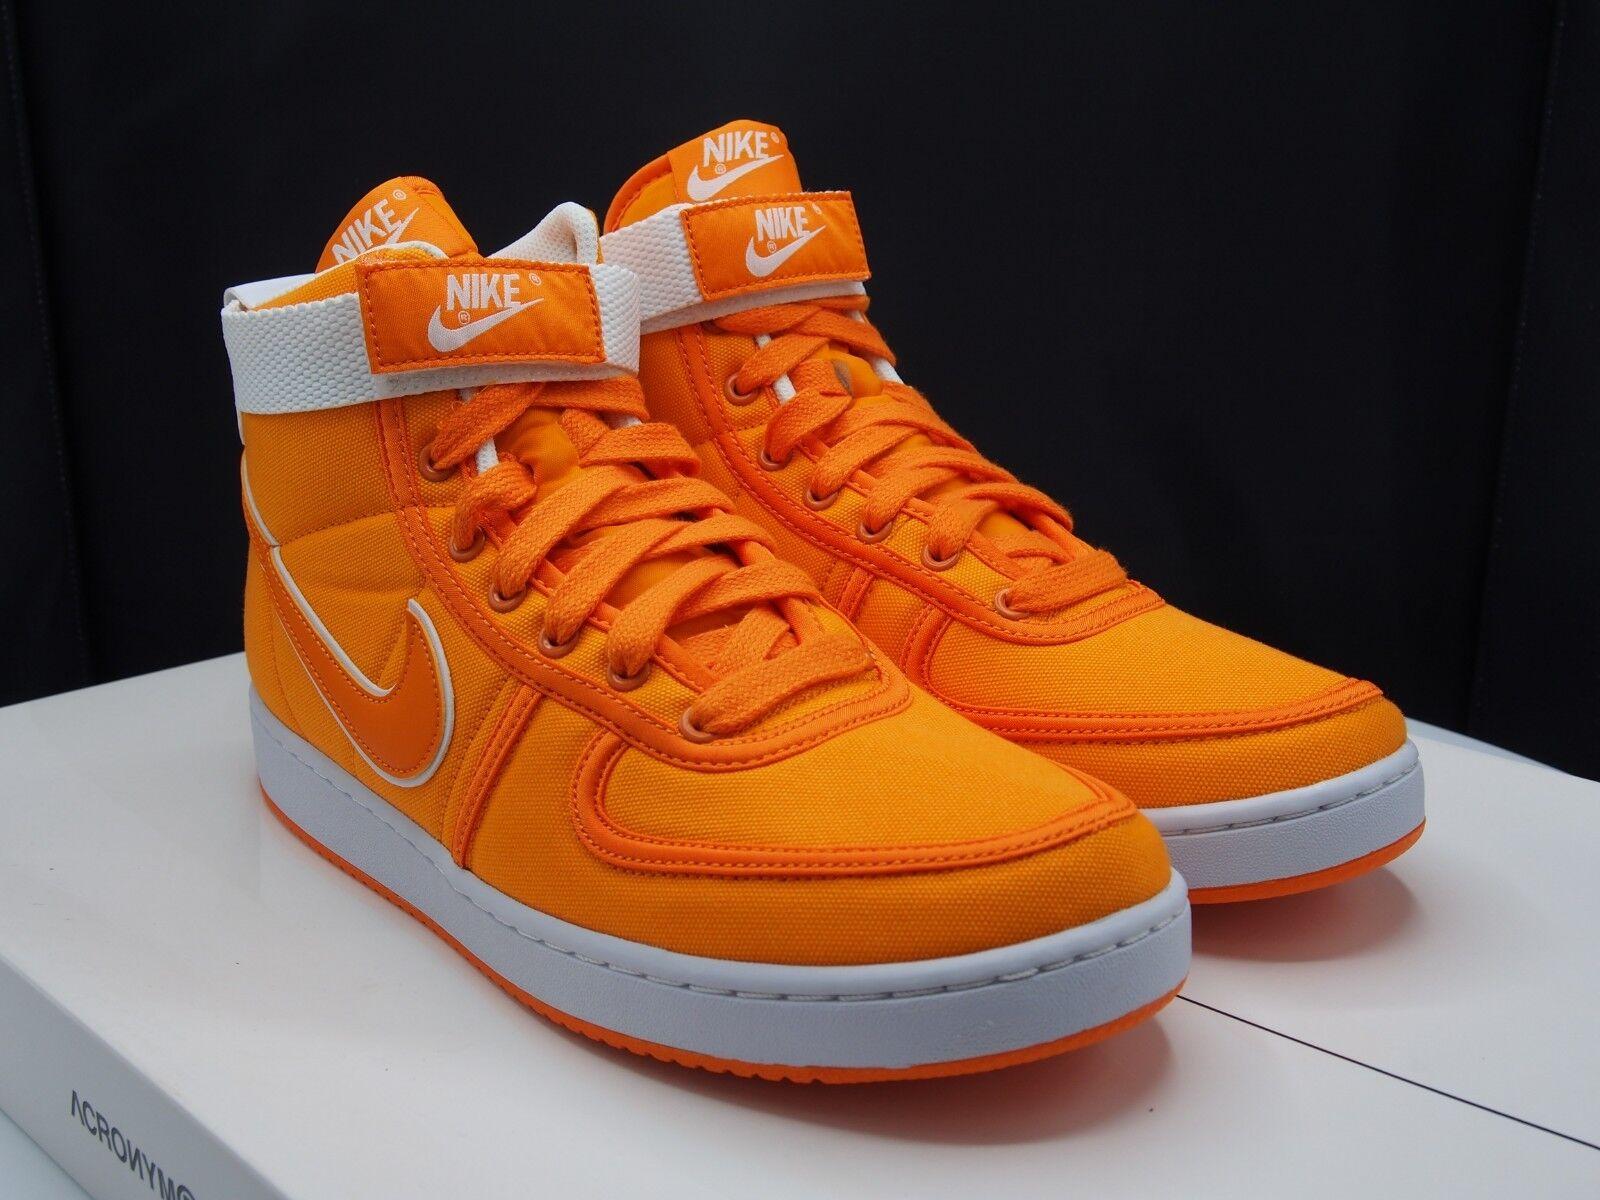 Nike Vandal AH8605 800 Brown Doc QS Supreme High